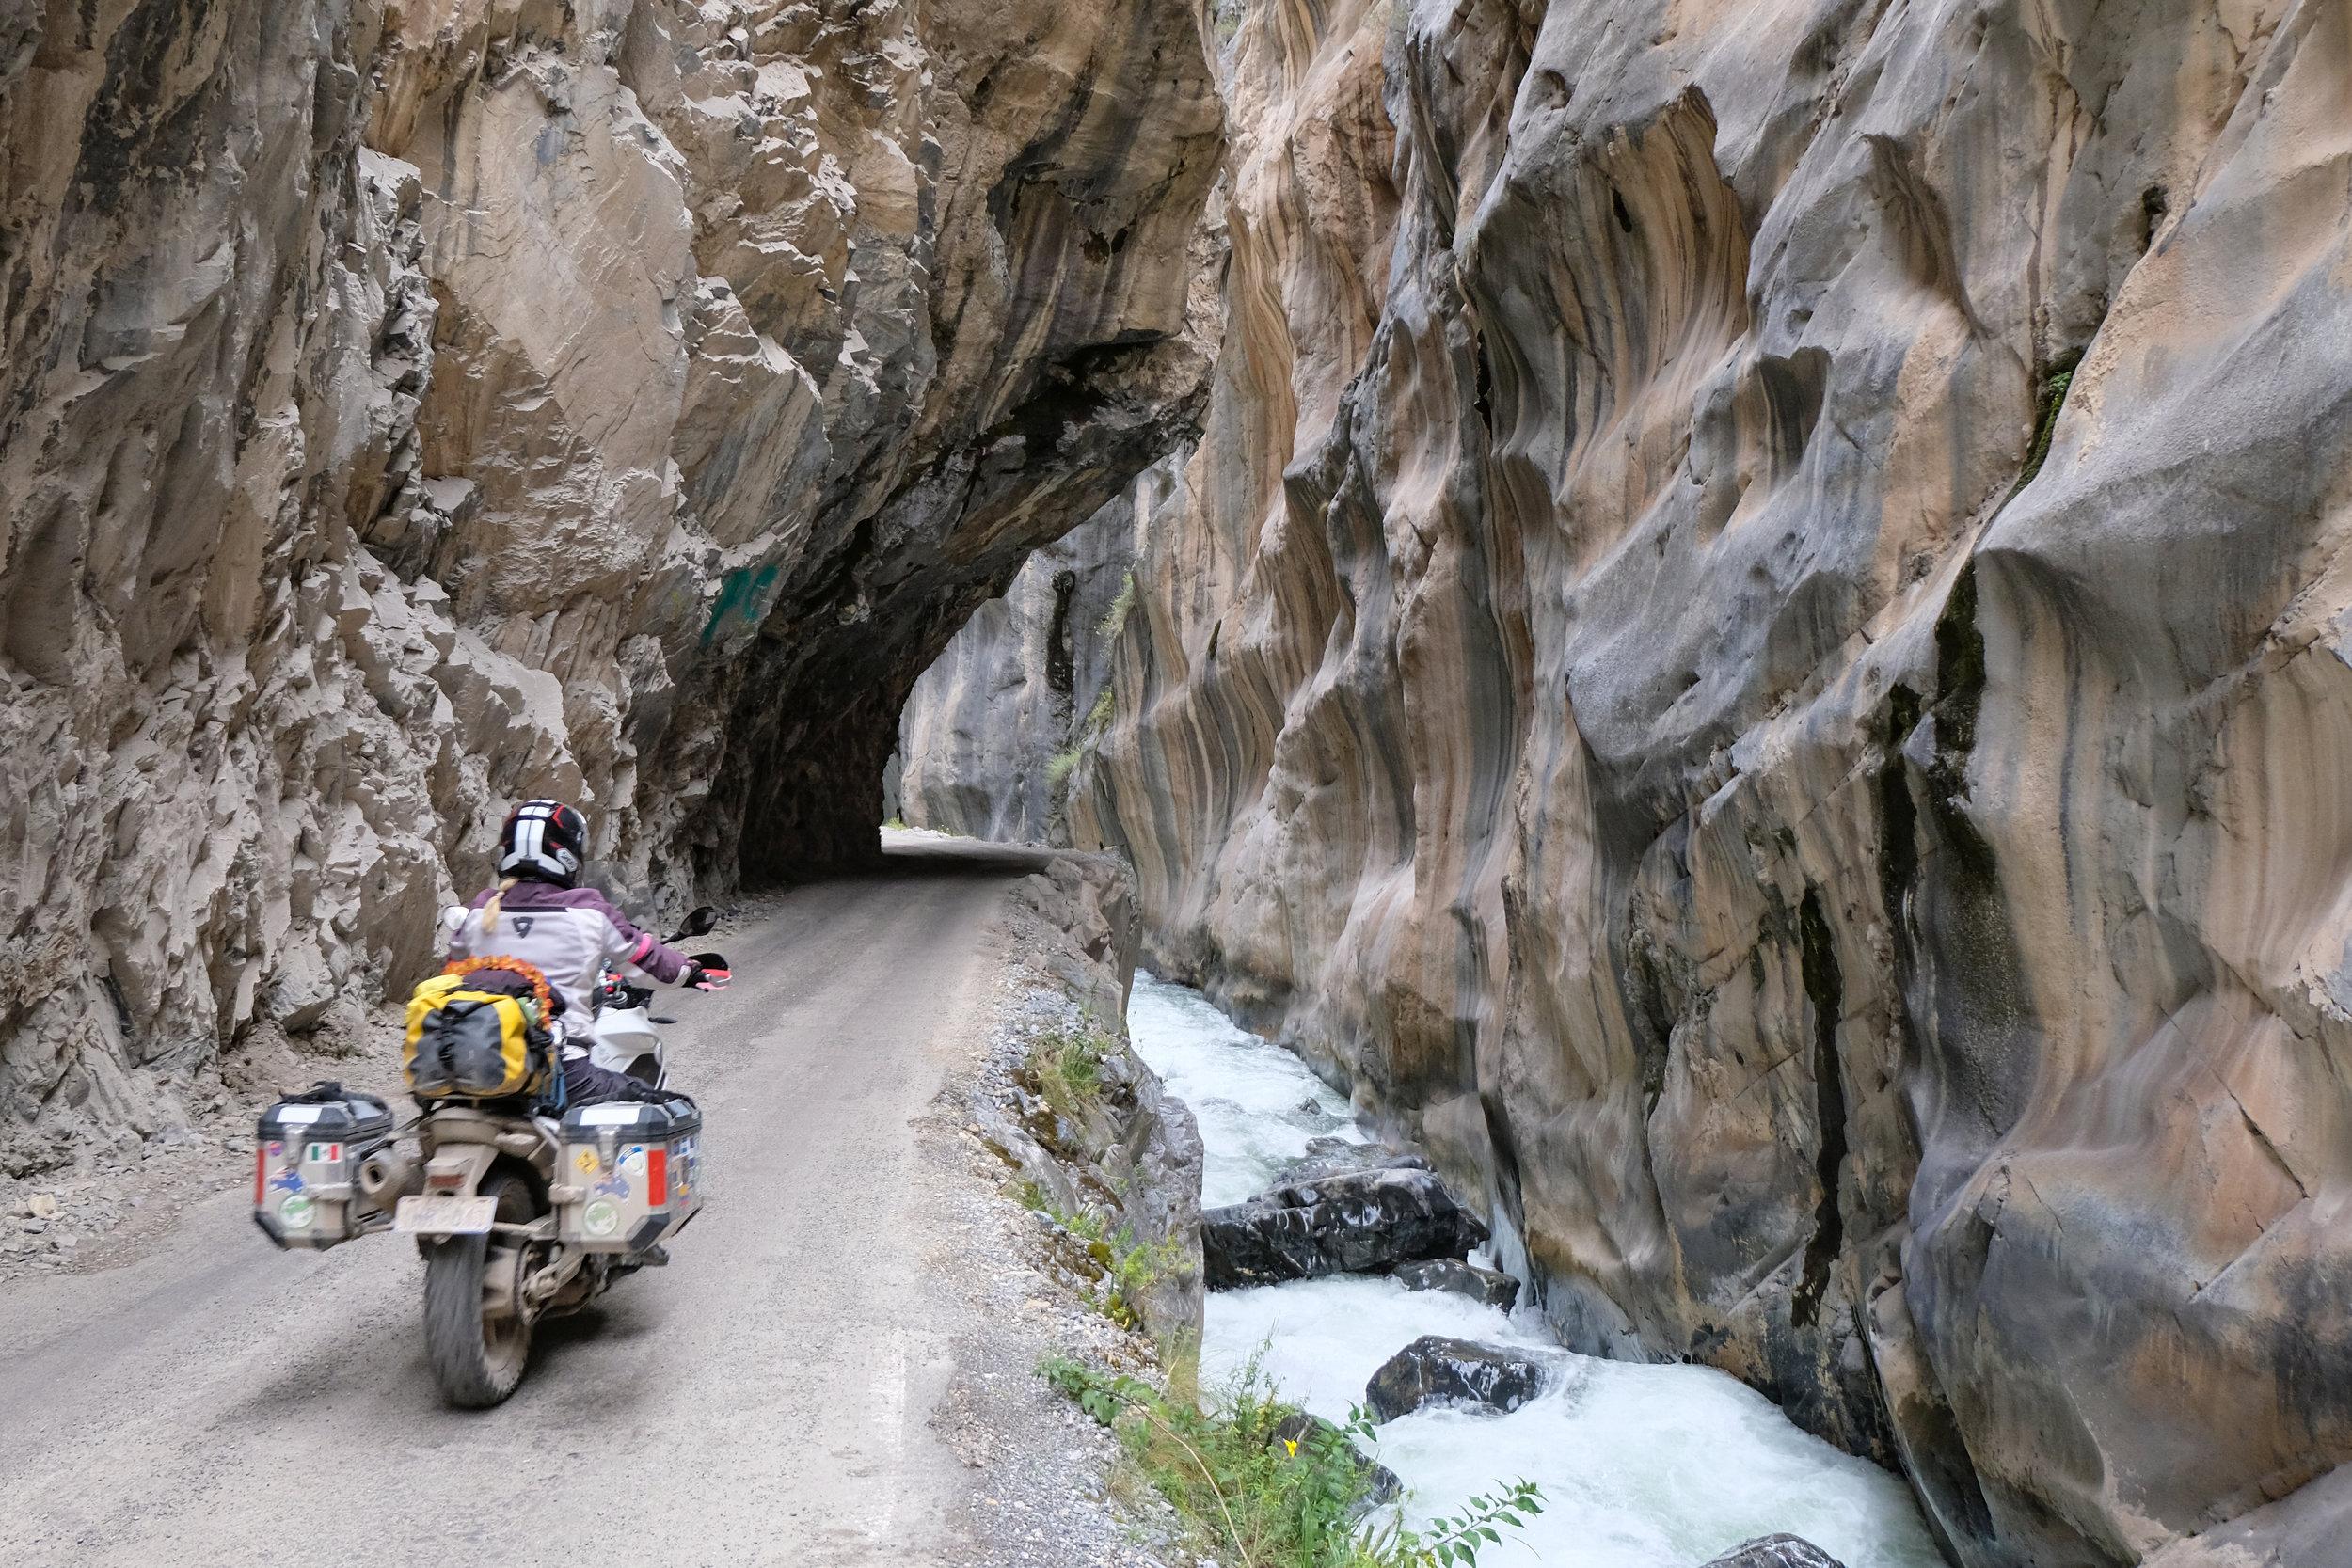 Paul-Neake-Hannaby-Adventure-Rider-Radio-Motorcycle-Podcast-6.jpg